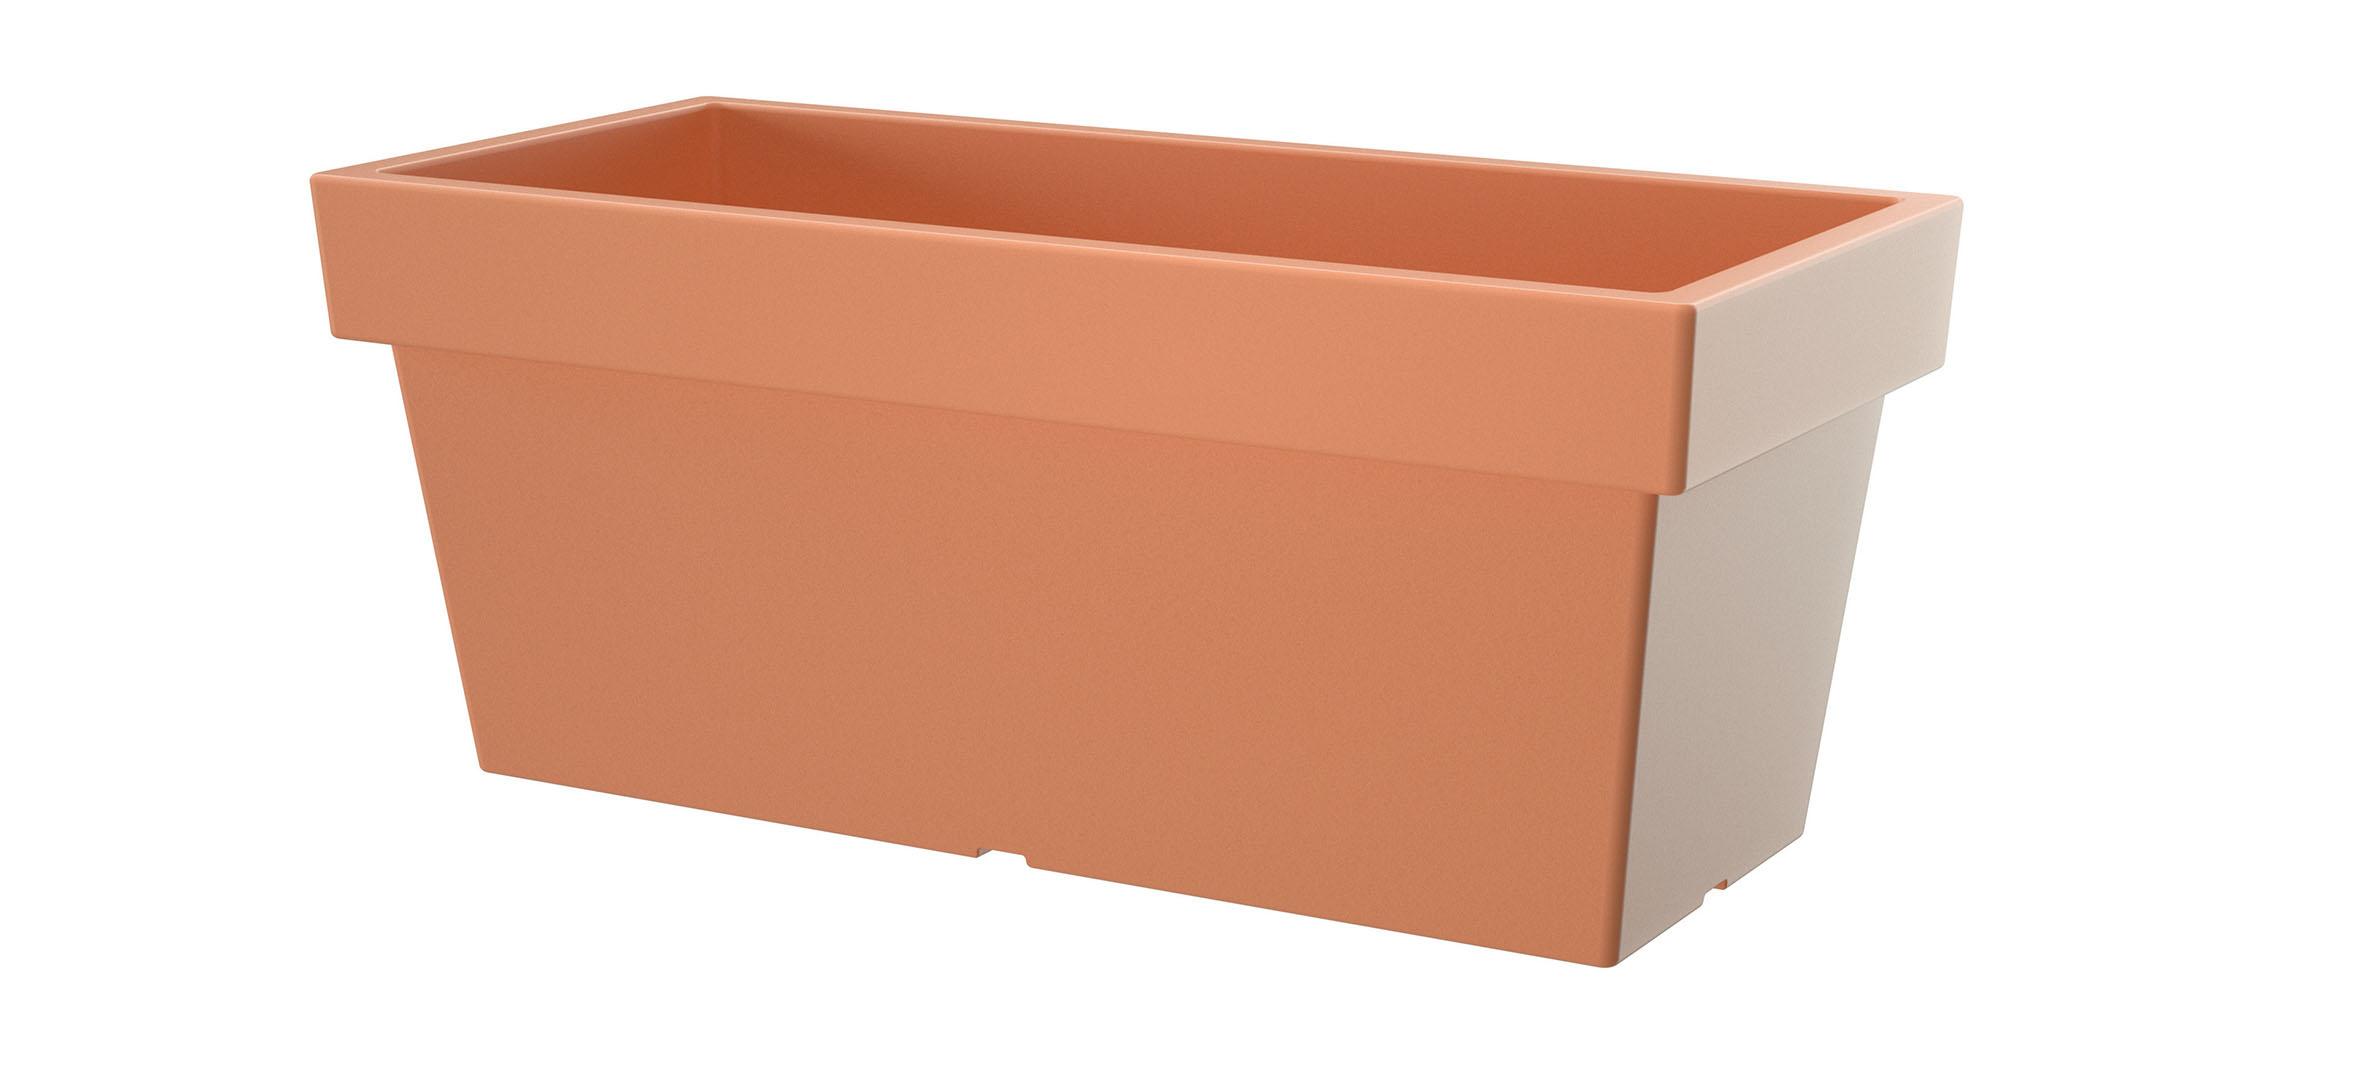 PROSPERPLAST Truhlík LOFLY CASE terakota 79,2 cm